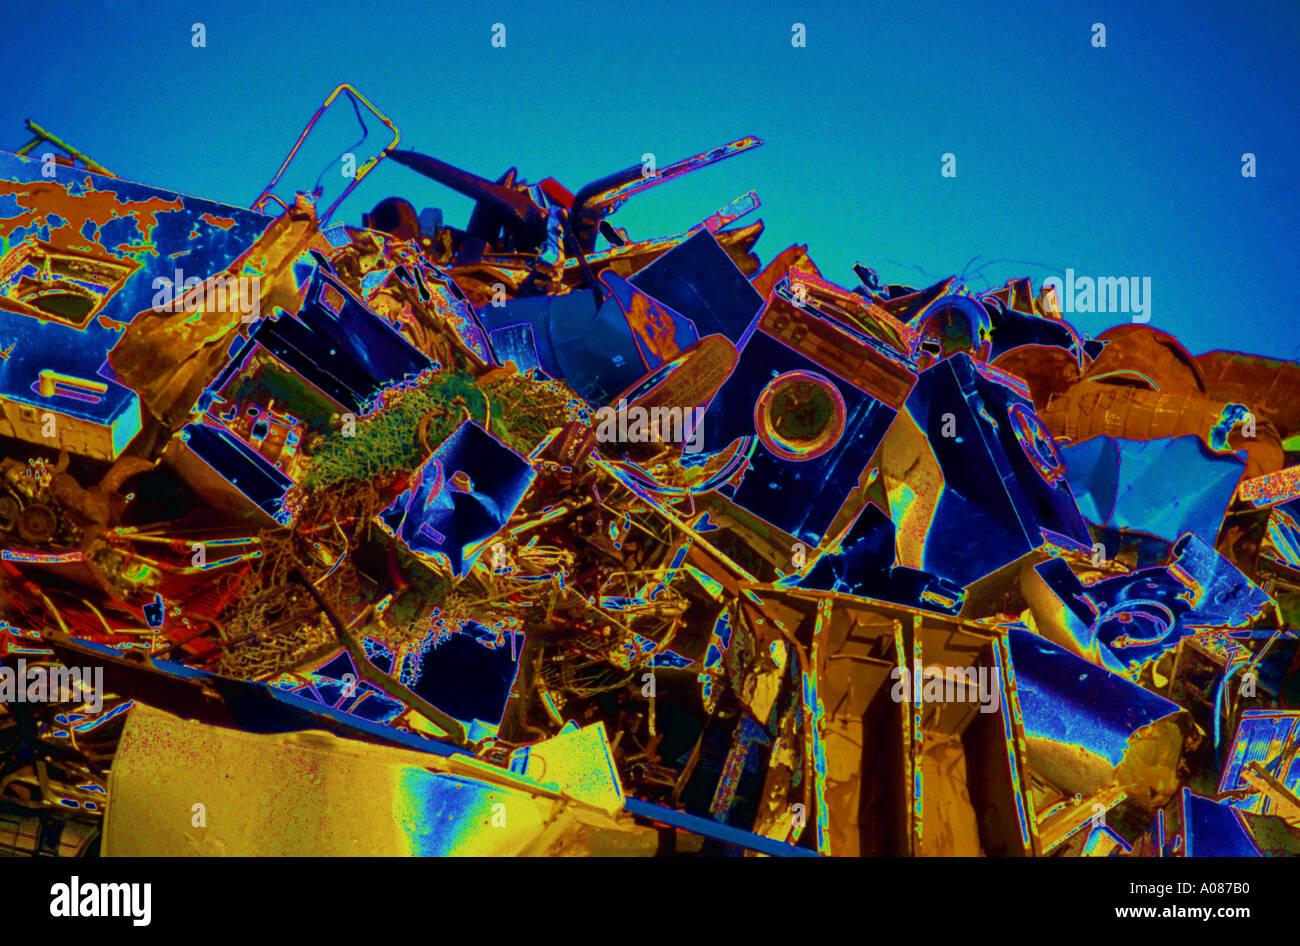 Effect Recycling reuse scrap metal rusty rubbish - Stock Image